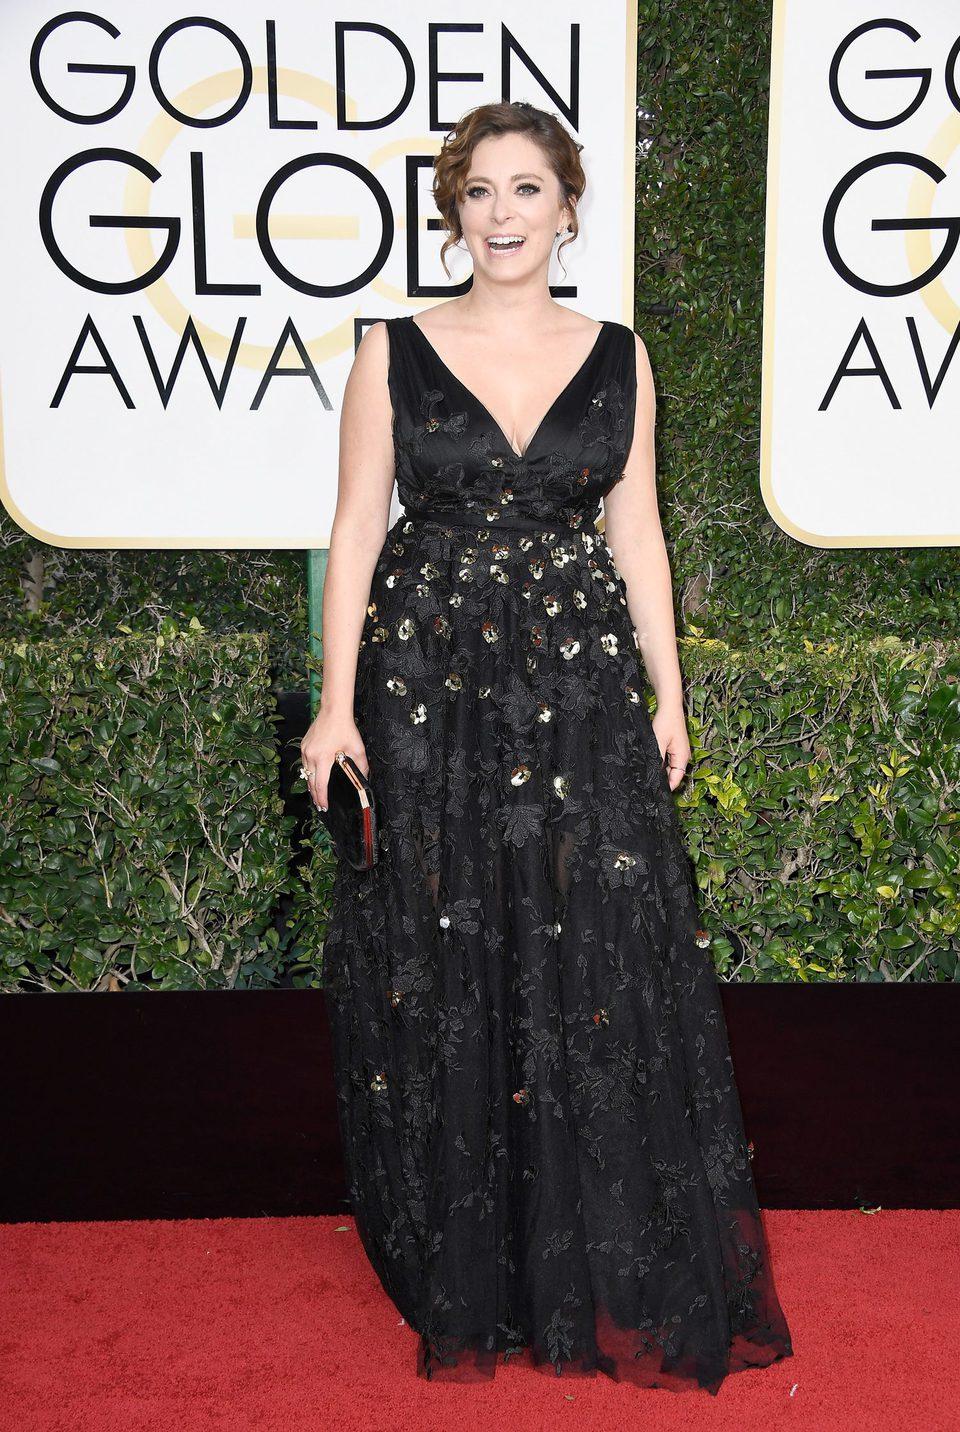 Rachel Bloom at Golden Globes 2017 red carpet